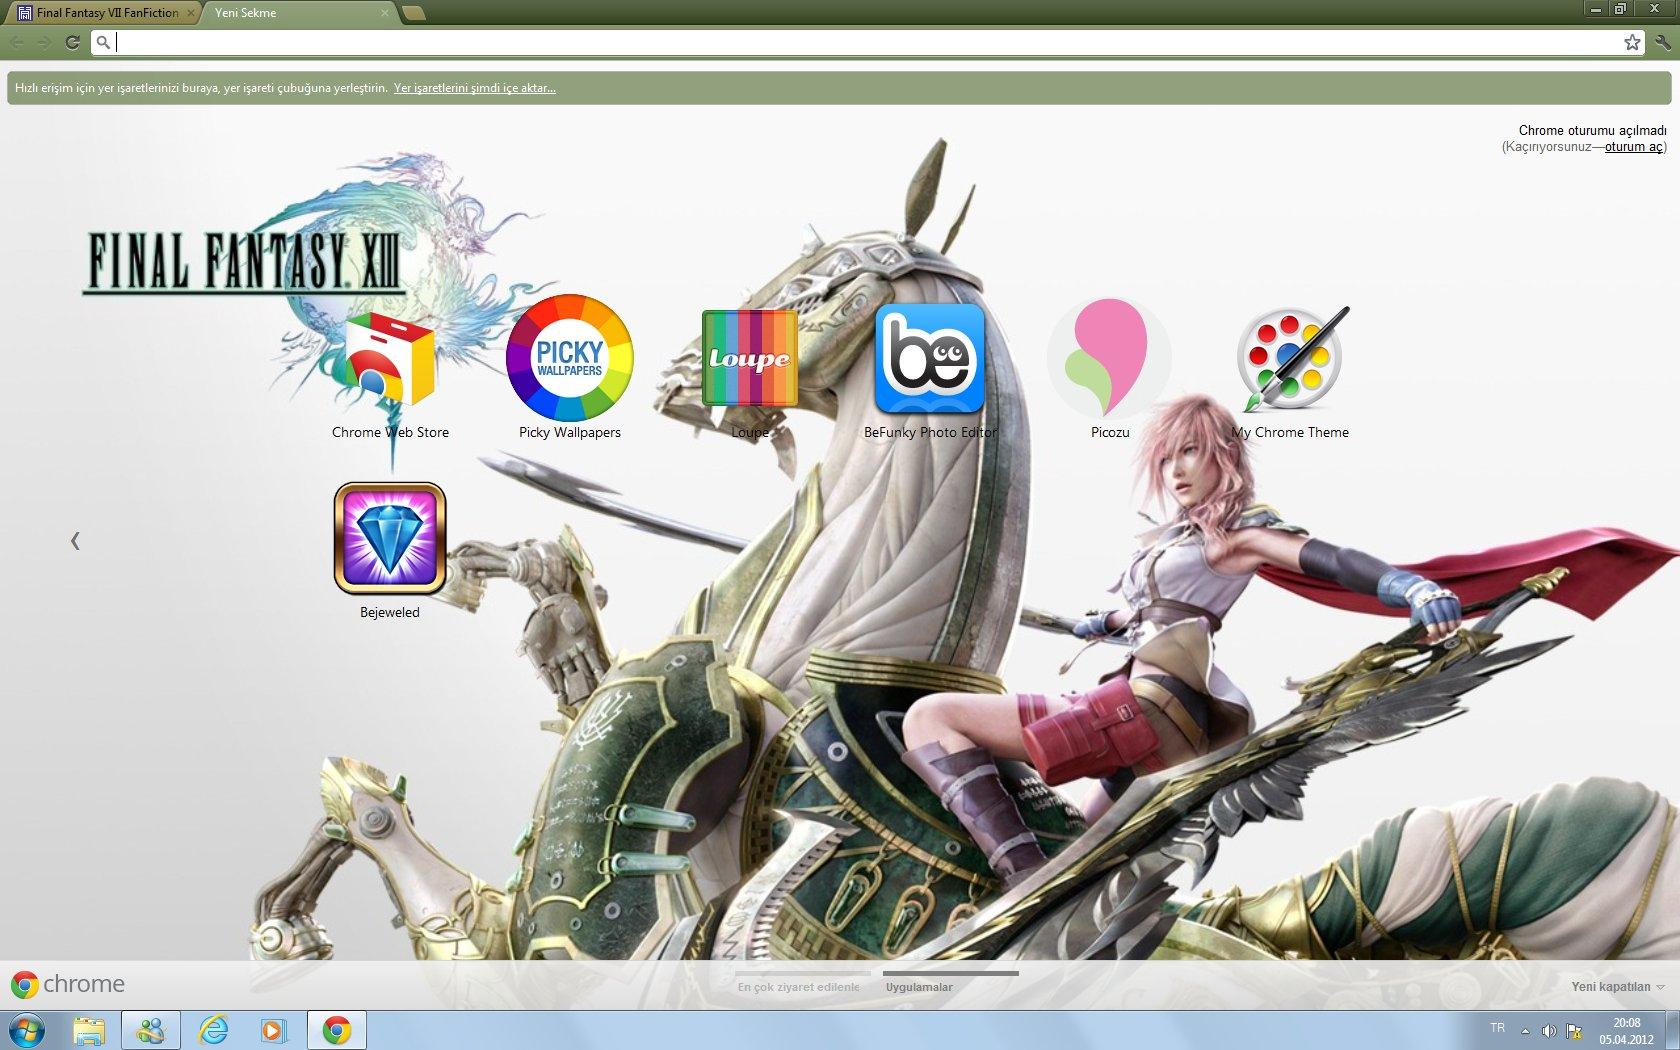 Google themes editor -  My Final Fantasy Xiii Google Chrome Theme By Clotigirl